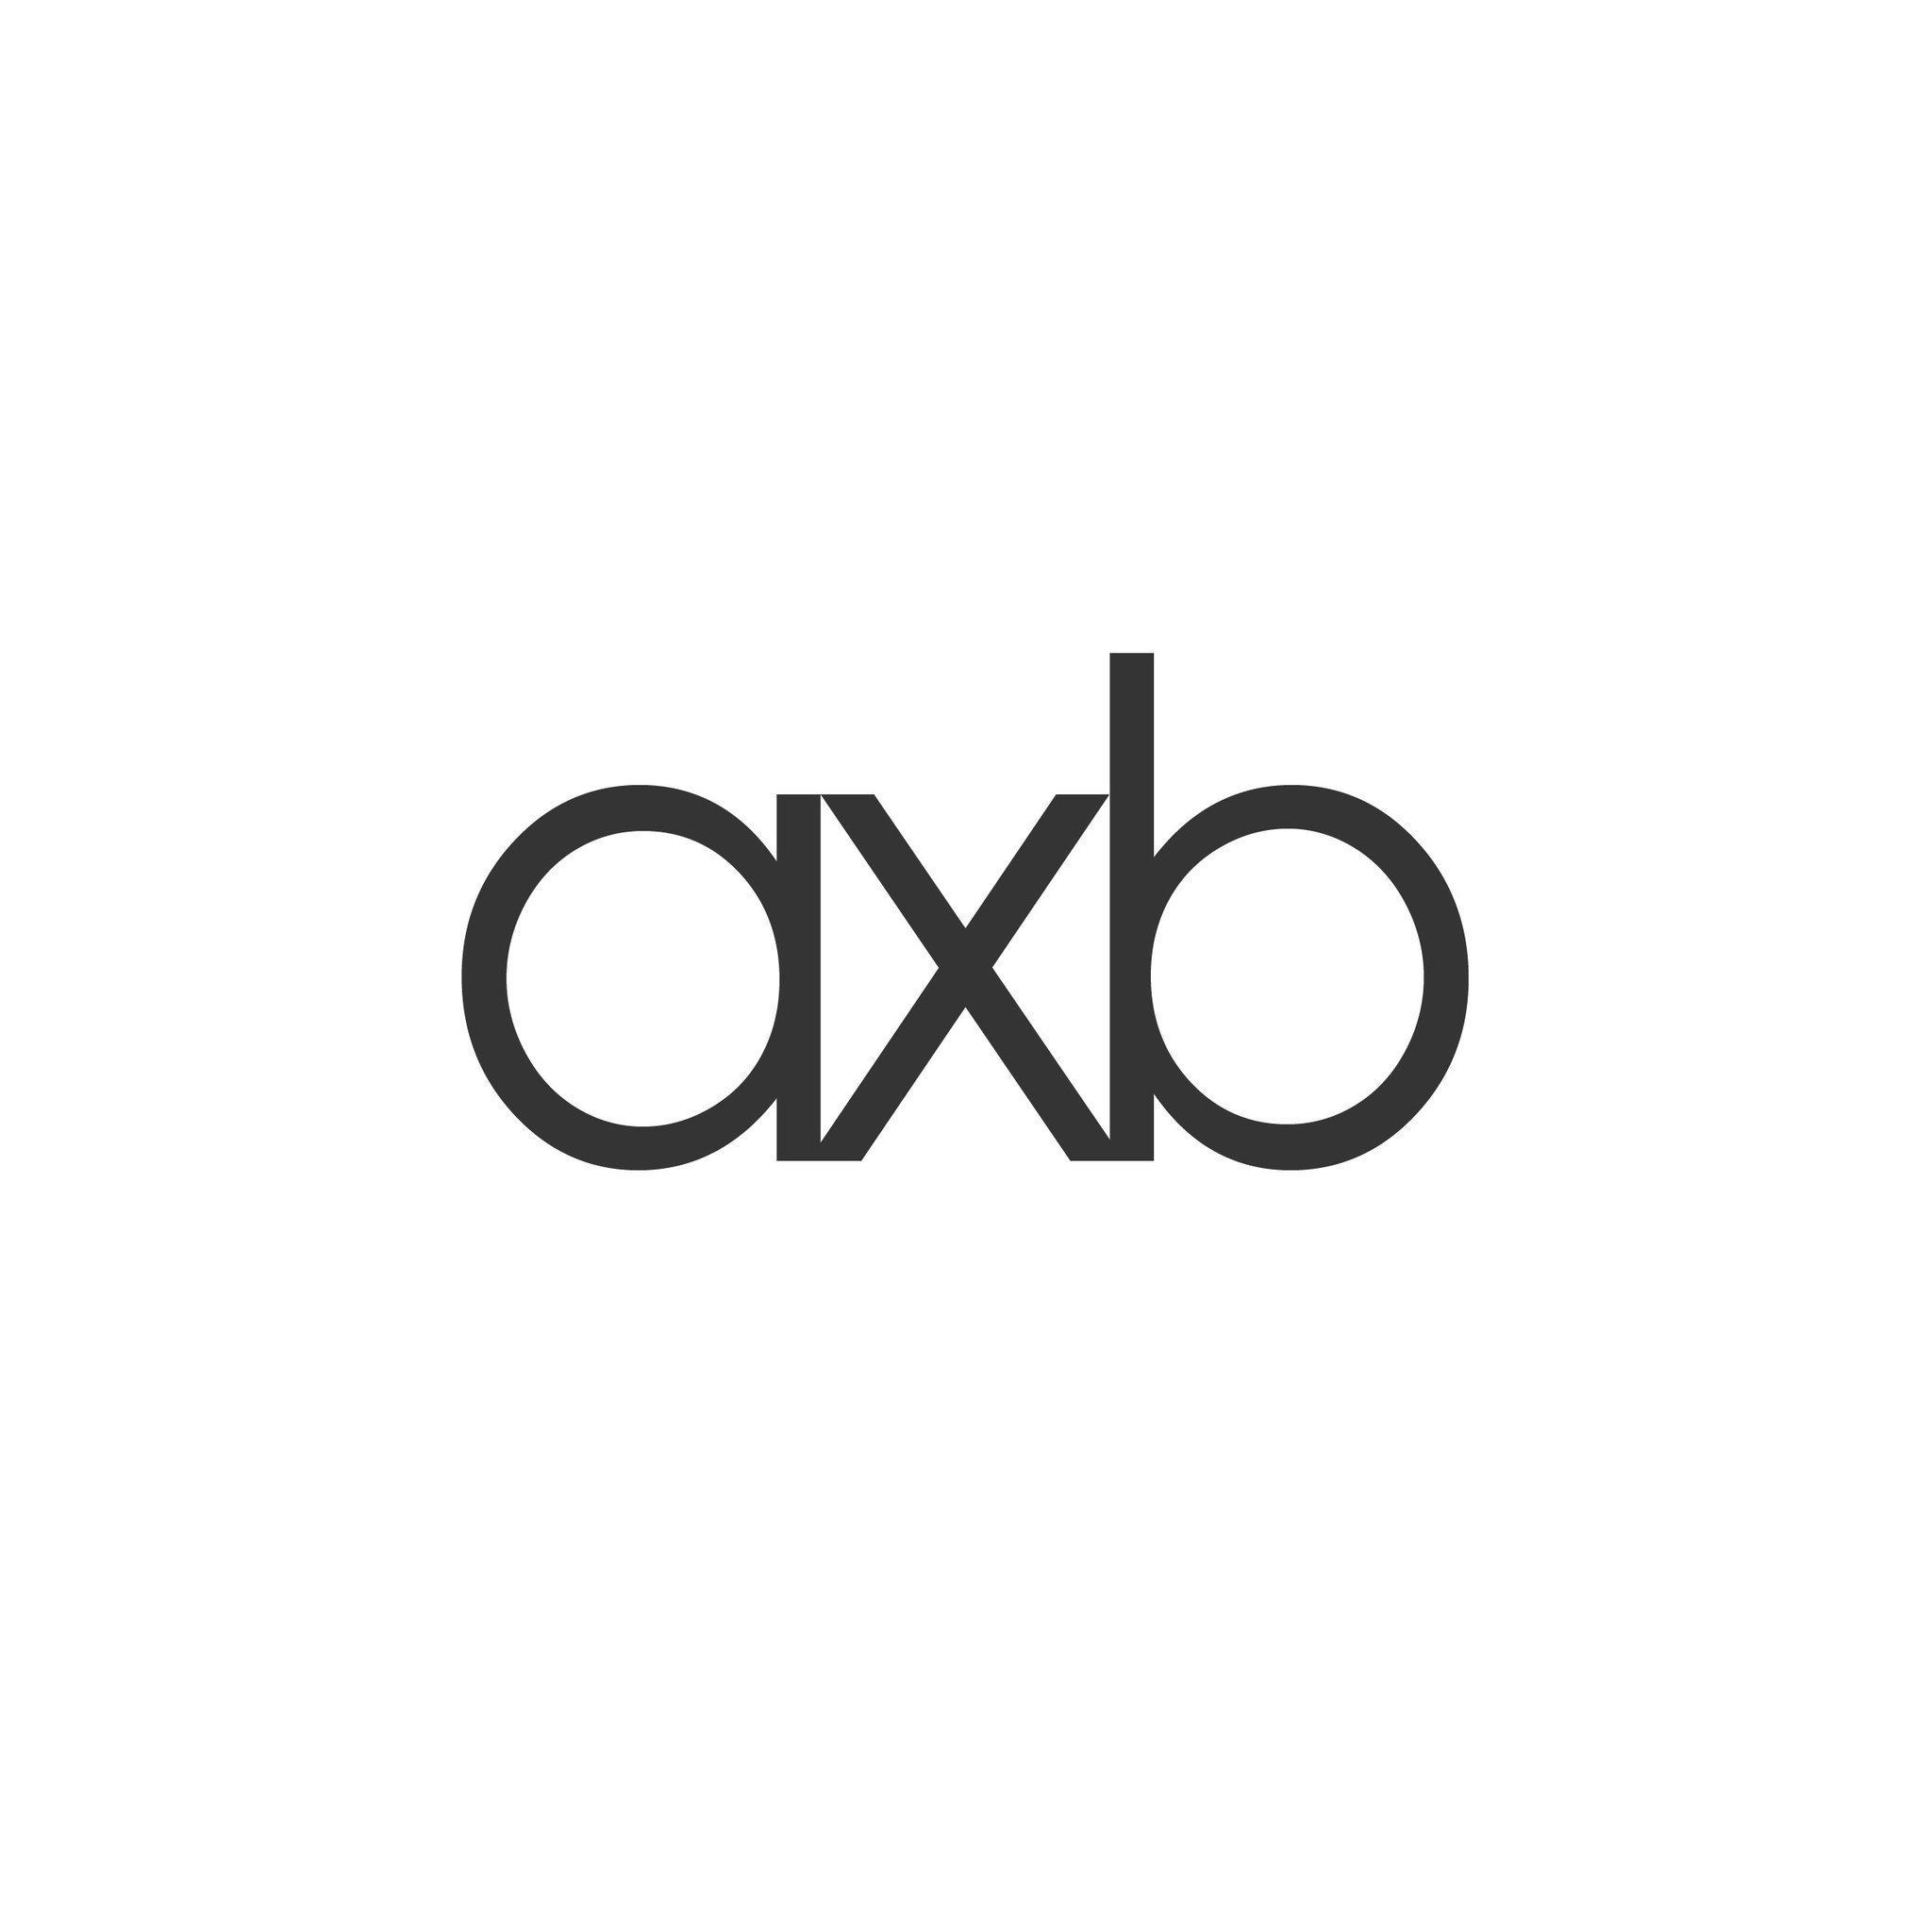 axb is